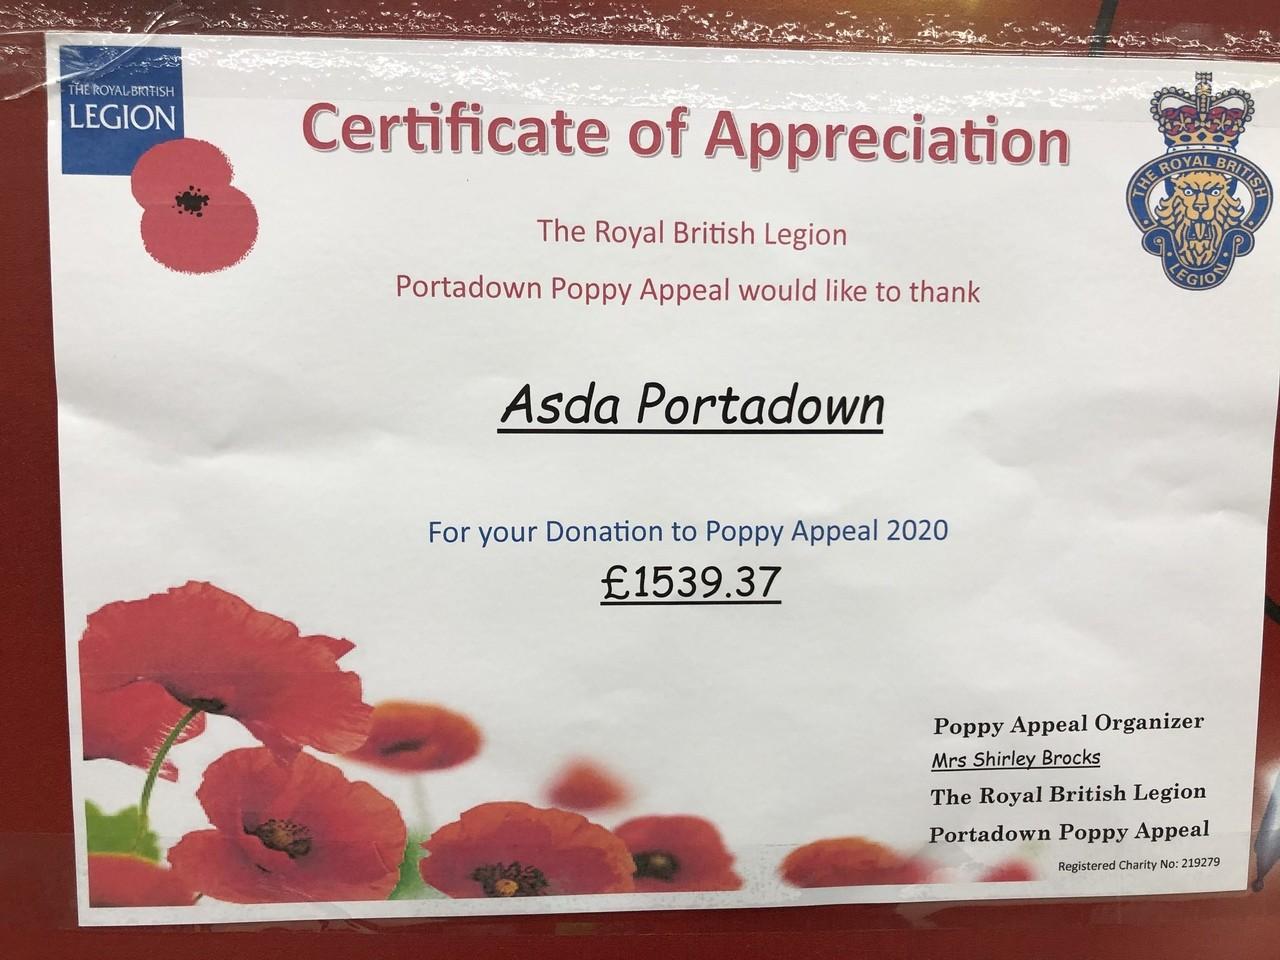 Poppy Appeal 2020 | Asda Portadown